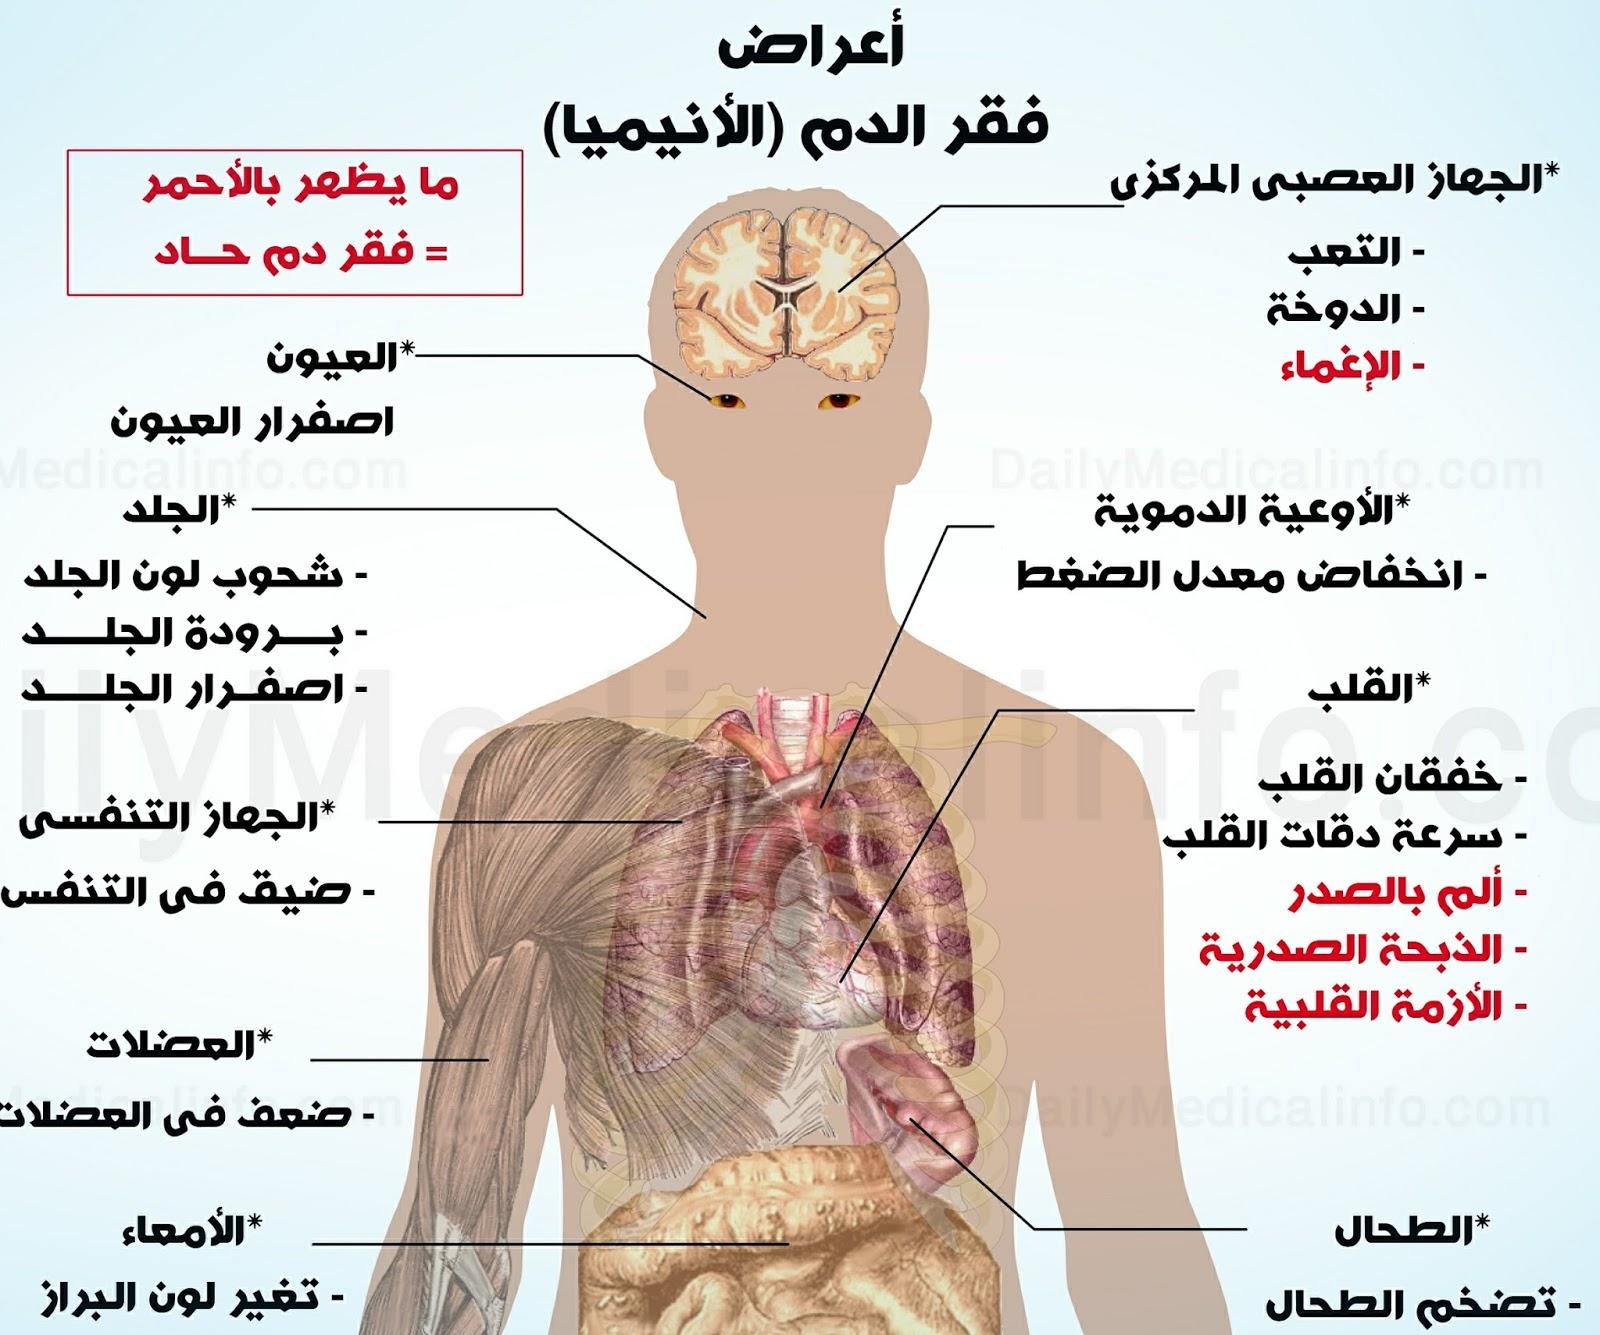 فقر الدم اعراضه